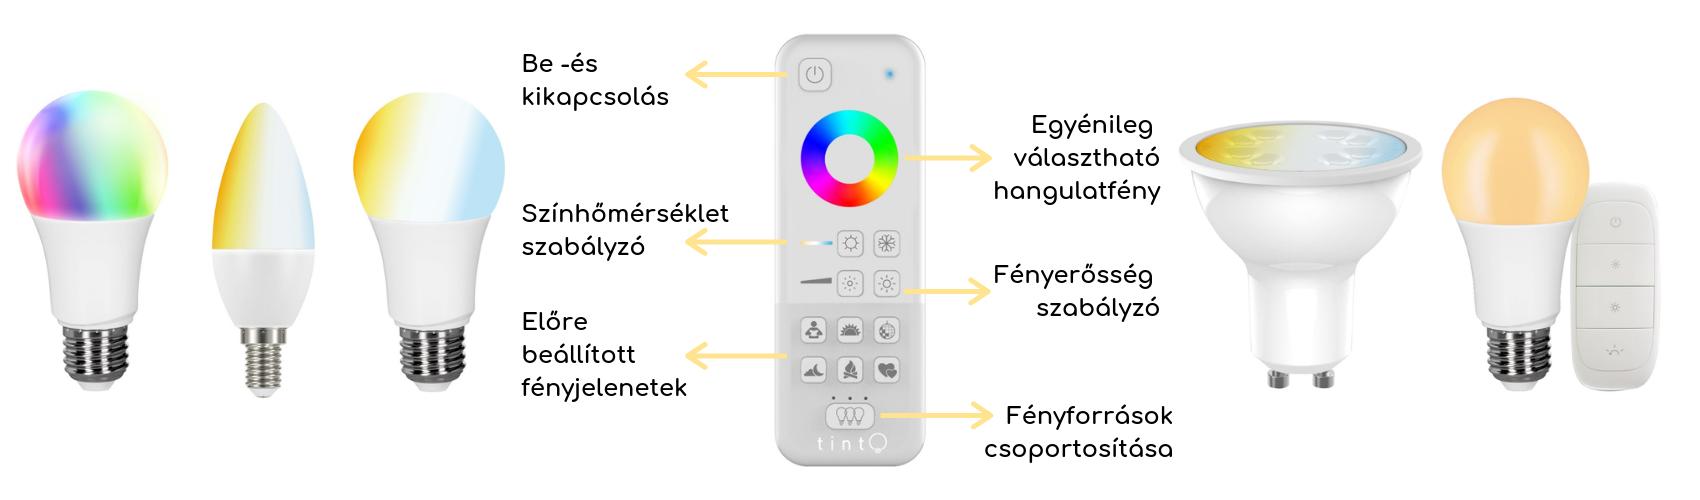 Müller Tint rendszer elemei